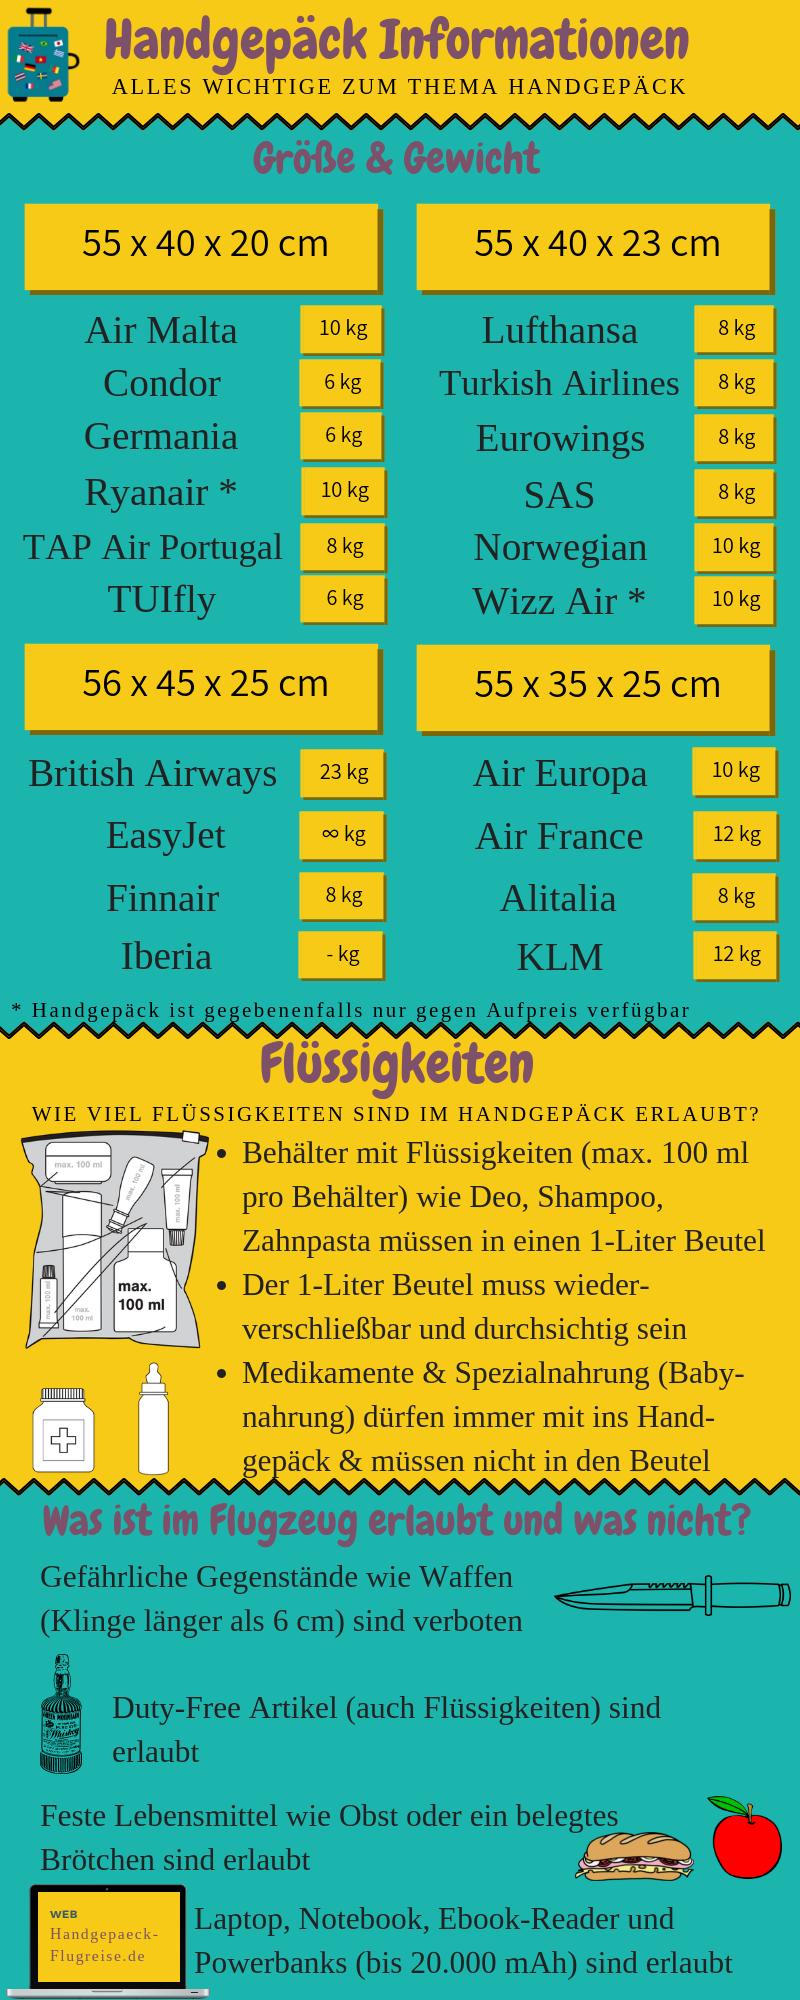 Handgepäck-Infografik